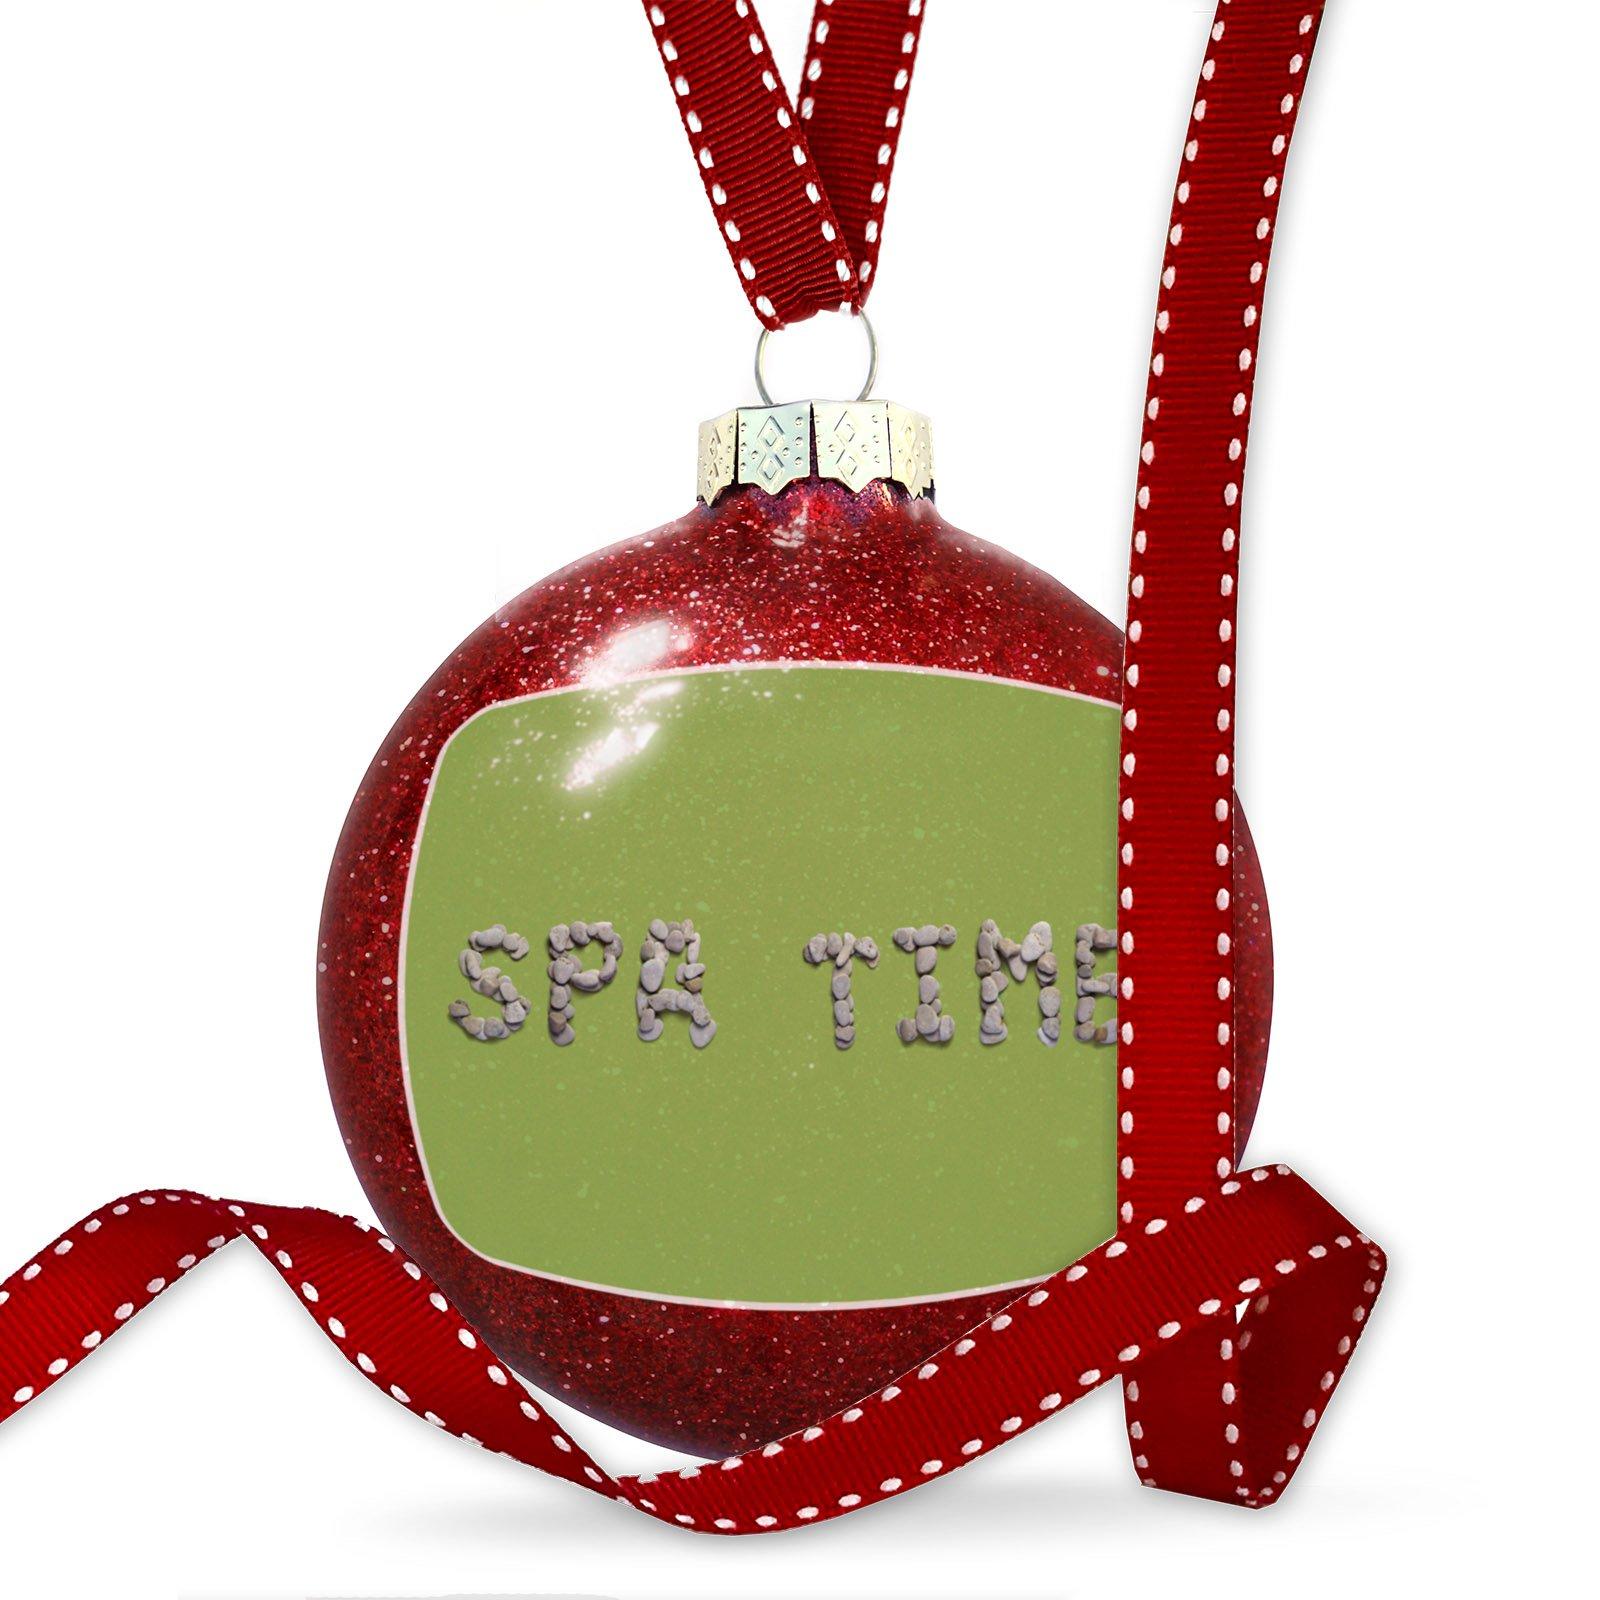 Christmas Decoration Spa Time Spa Stones Rocks Ornament